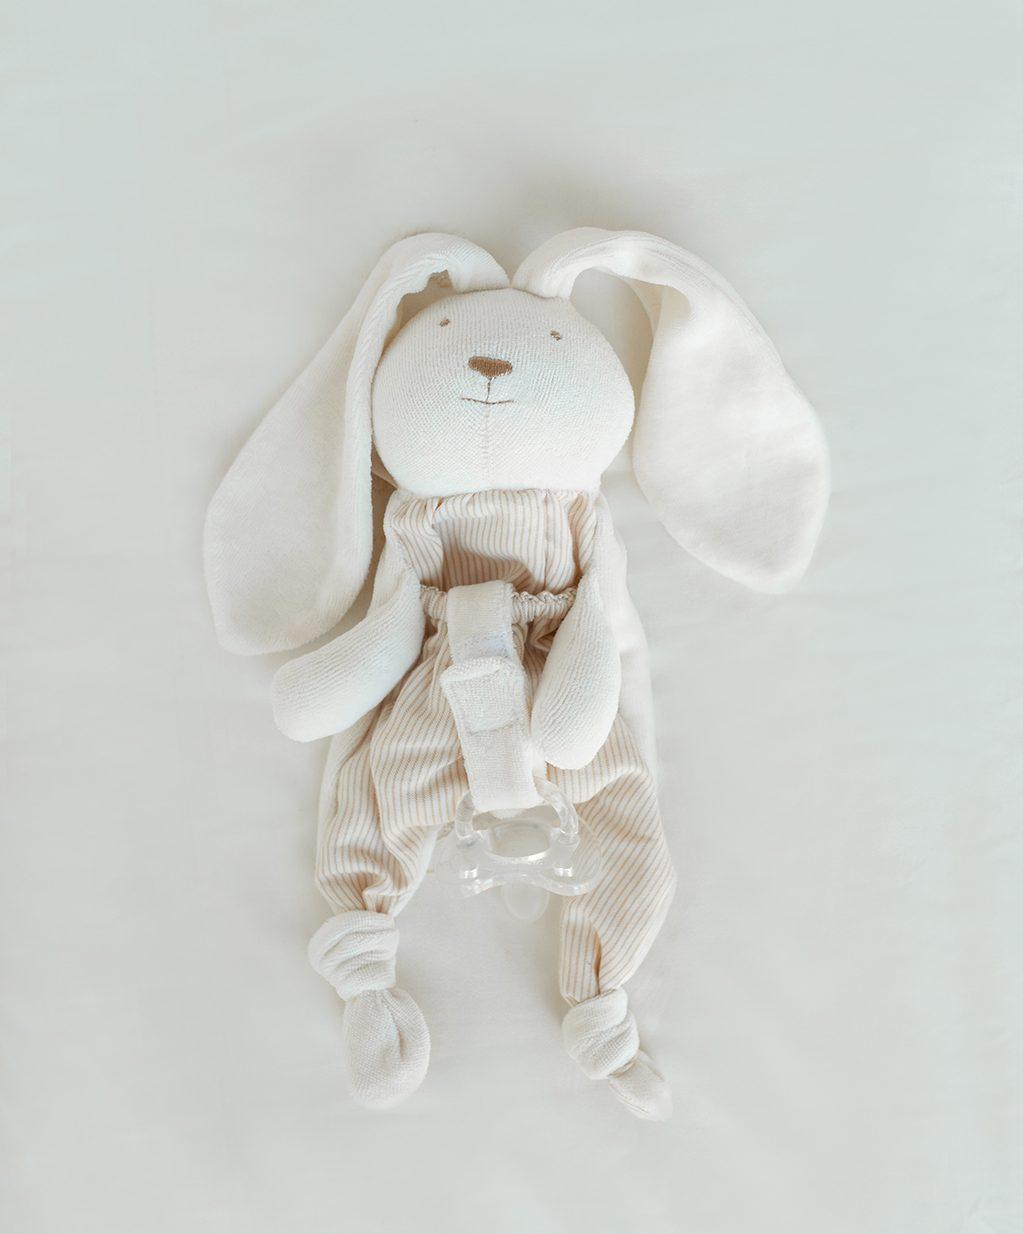 Porta-chupeta com coelhinho